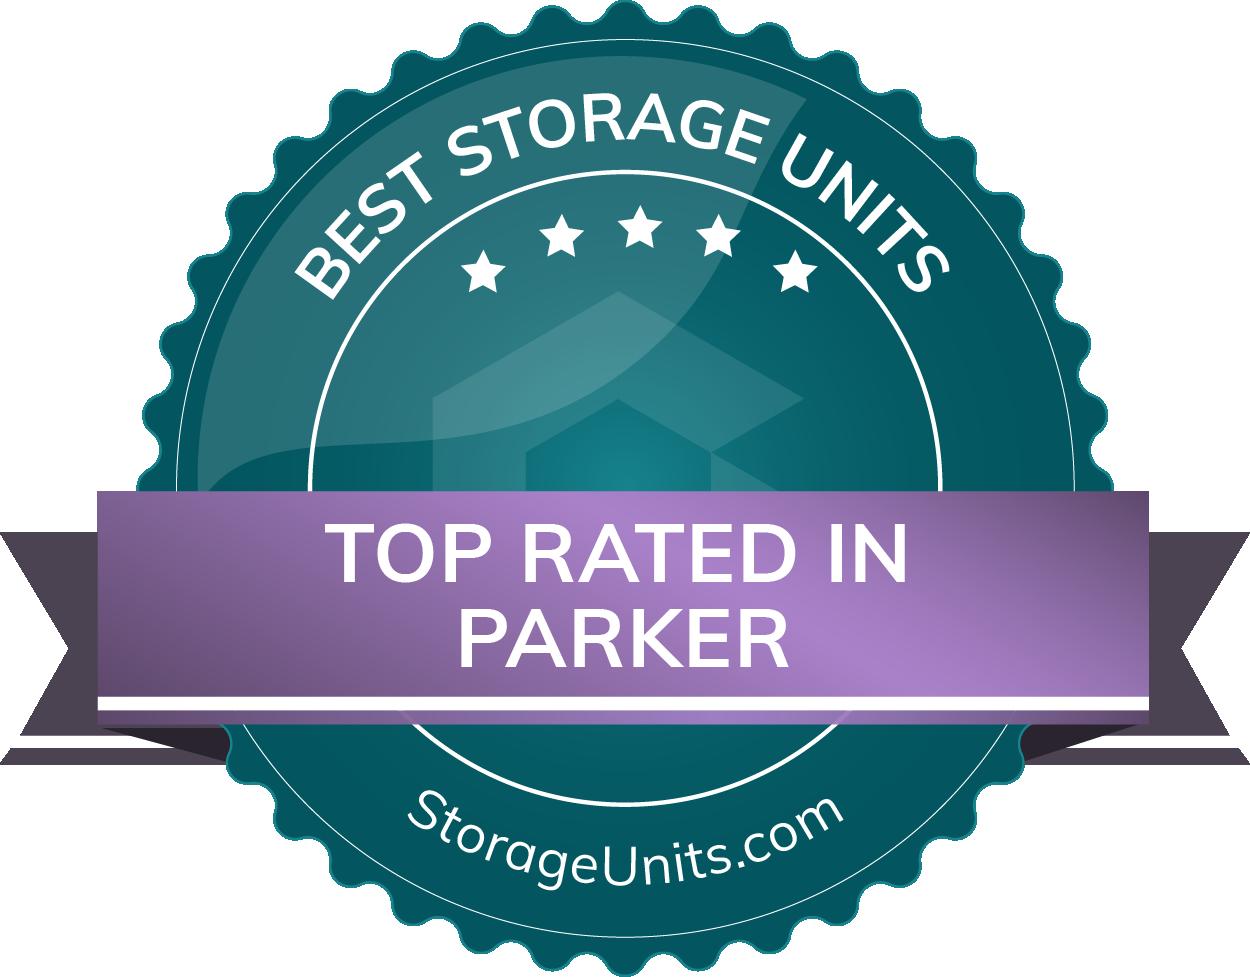 Best Self Storage Units in Parker, CO